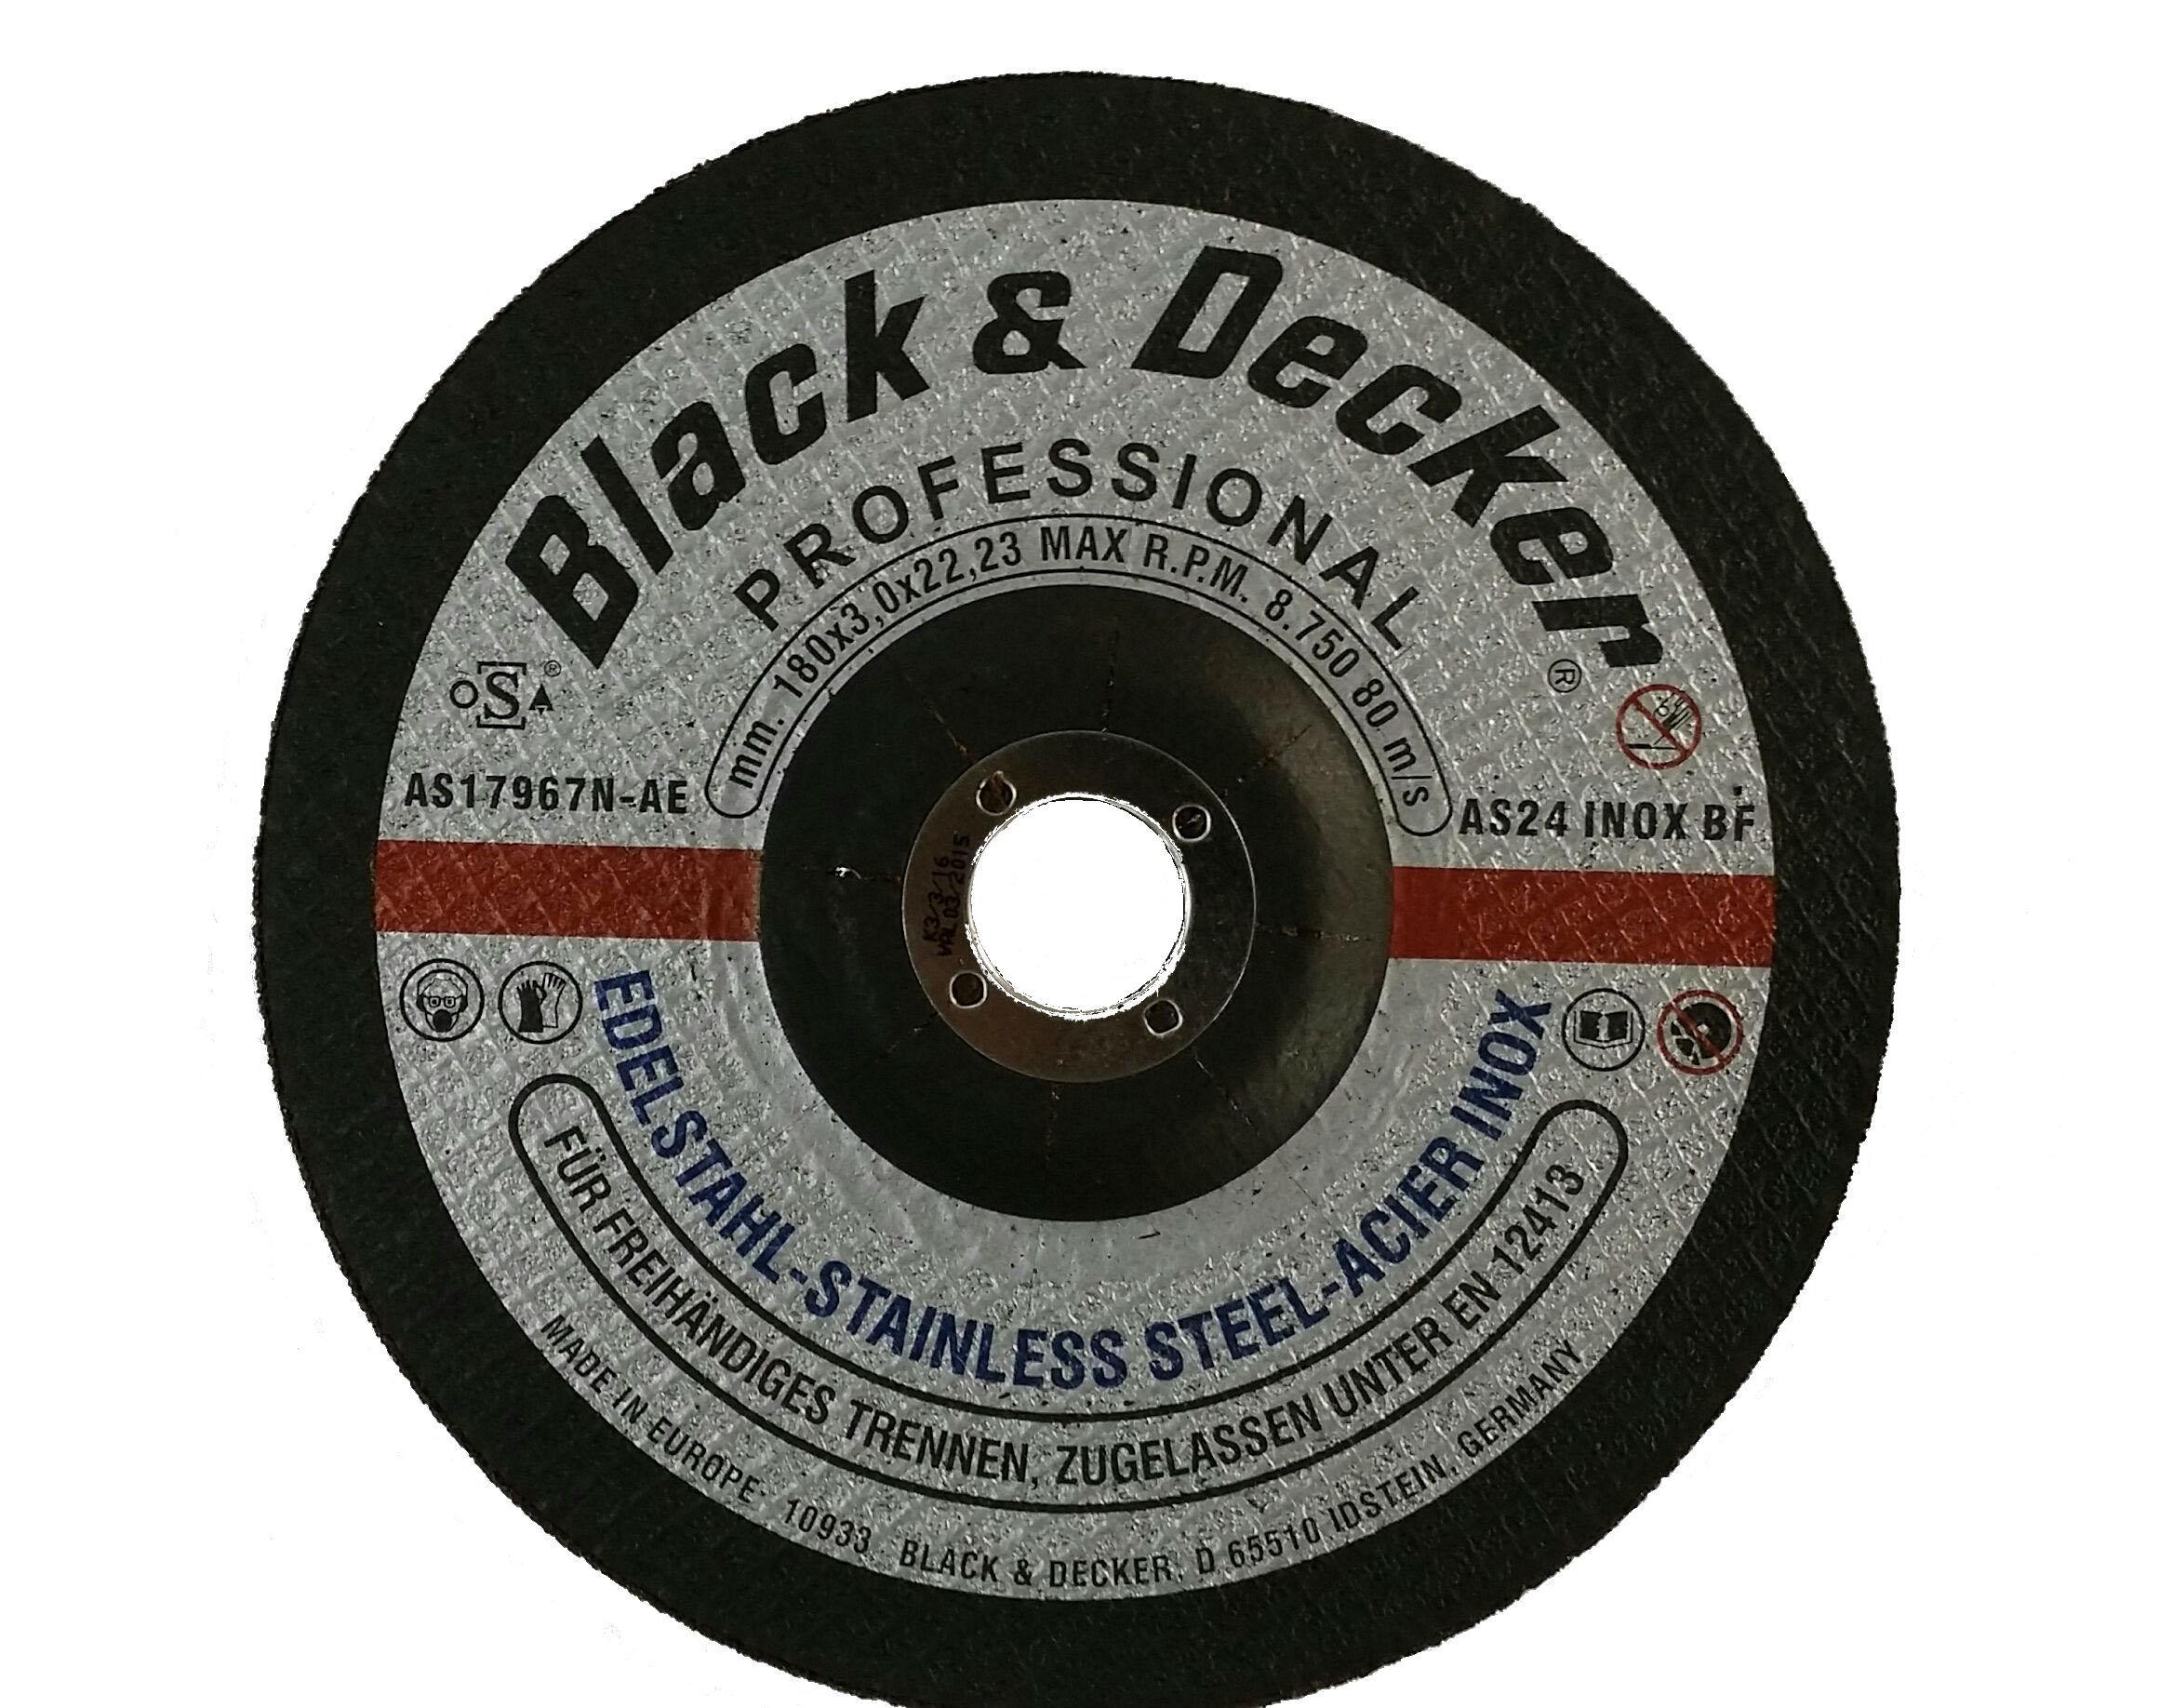 Black & Decker AS17967N-AE - 7-inch S.Steel Cutting Disc